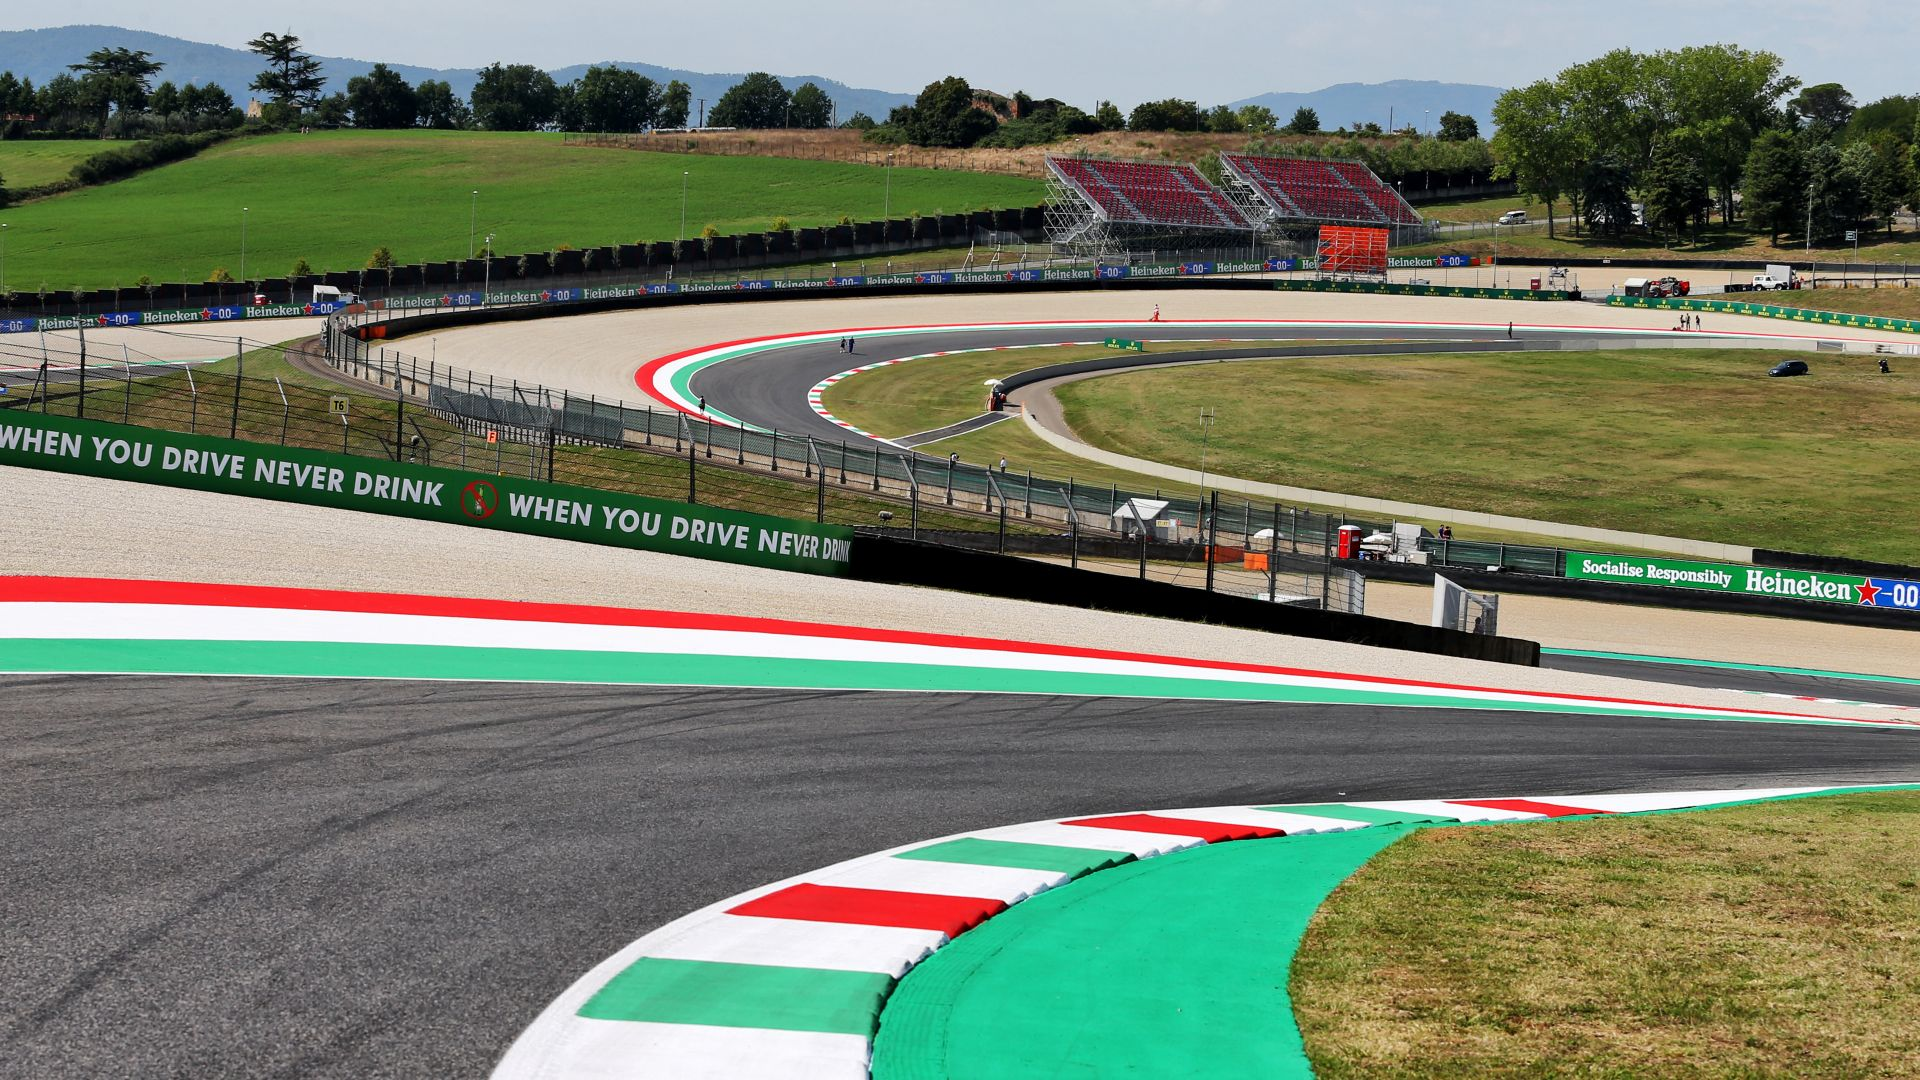 Calendario F1 2021: opzioni Nurburgring e Mugello